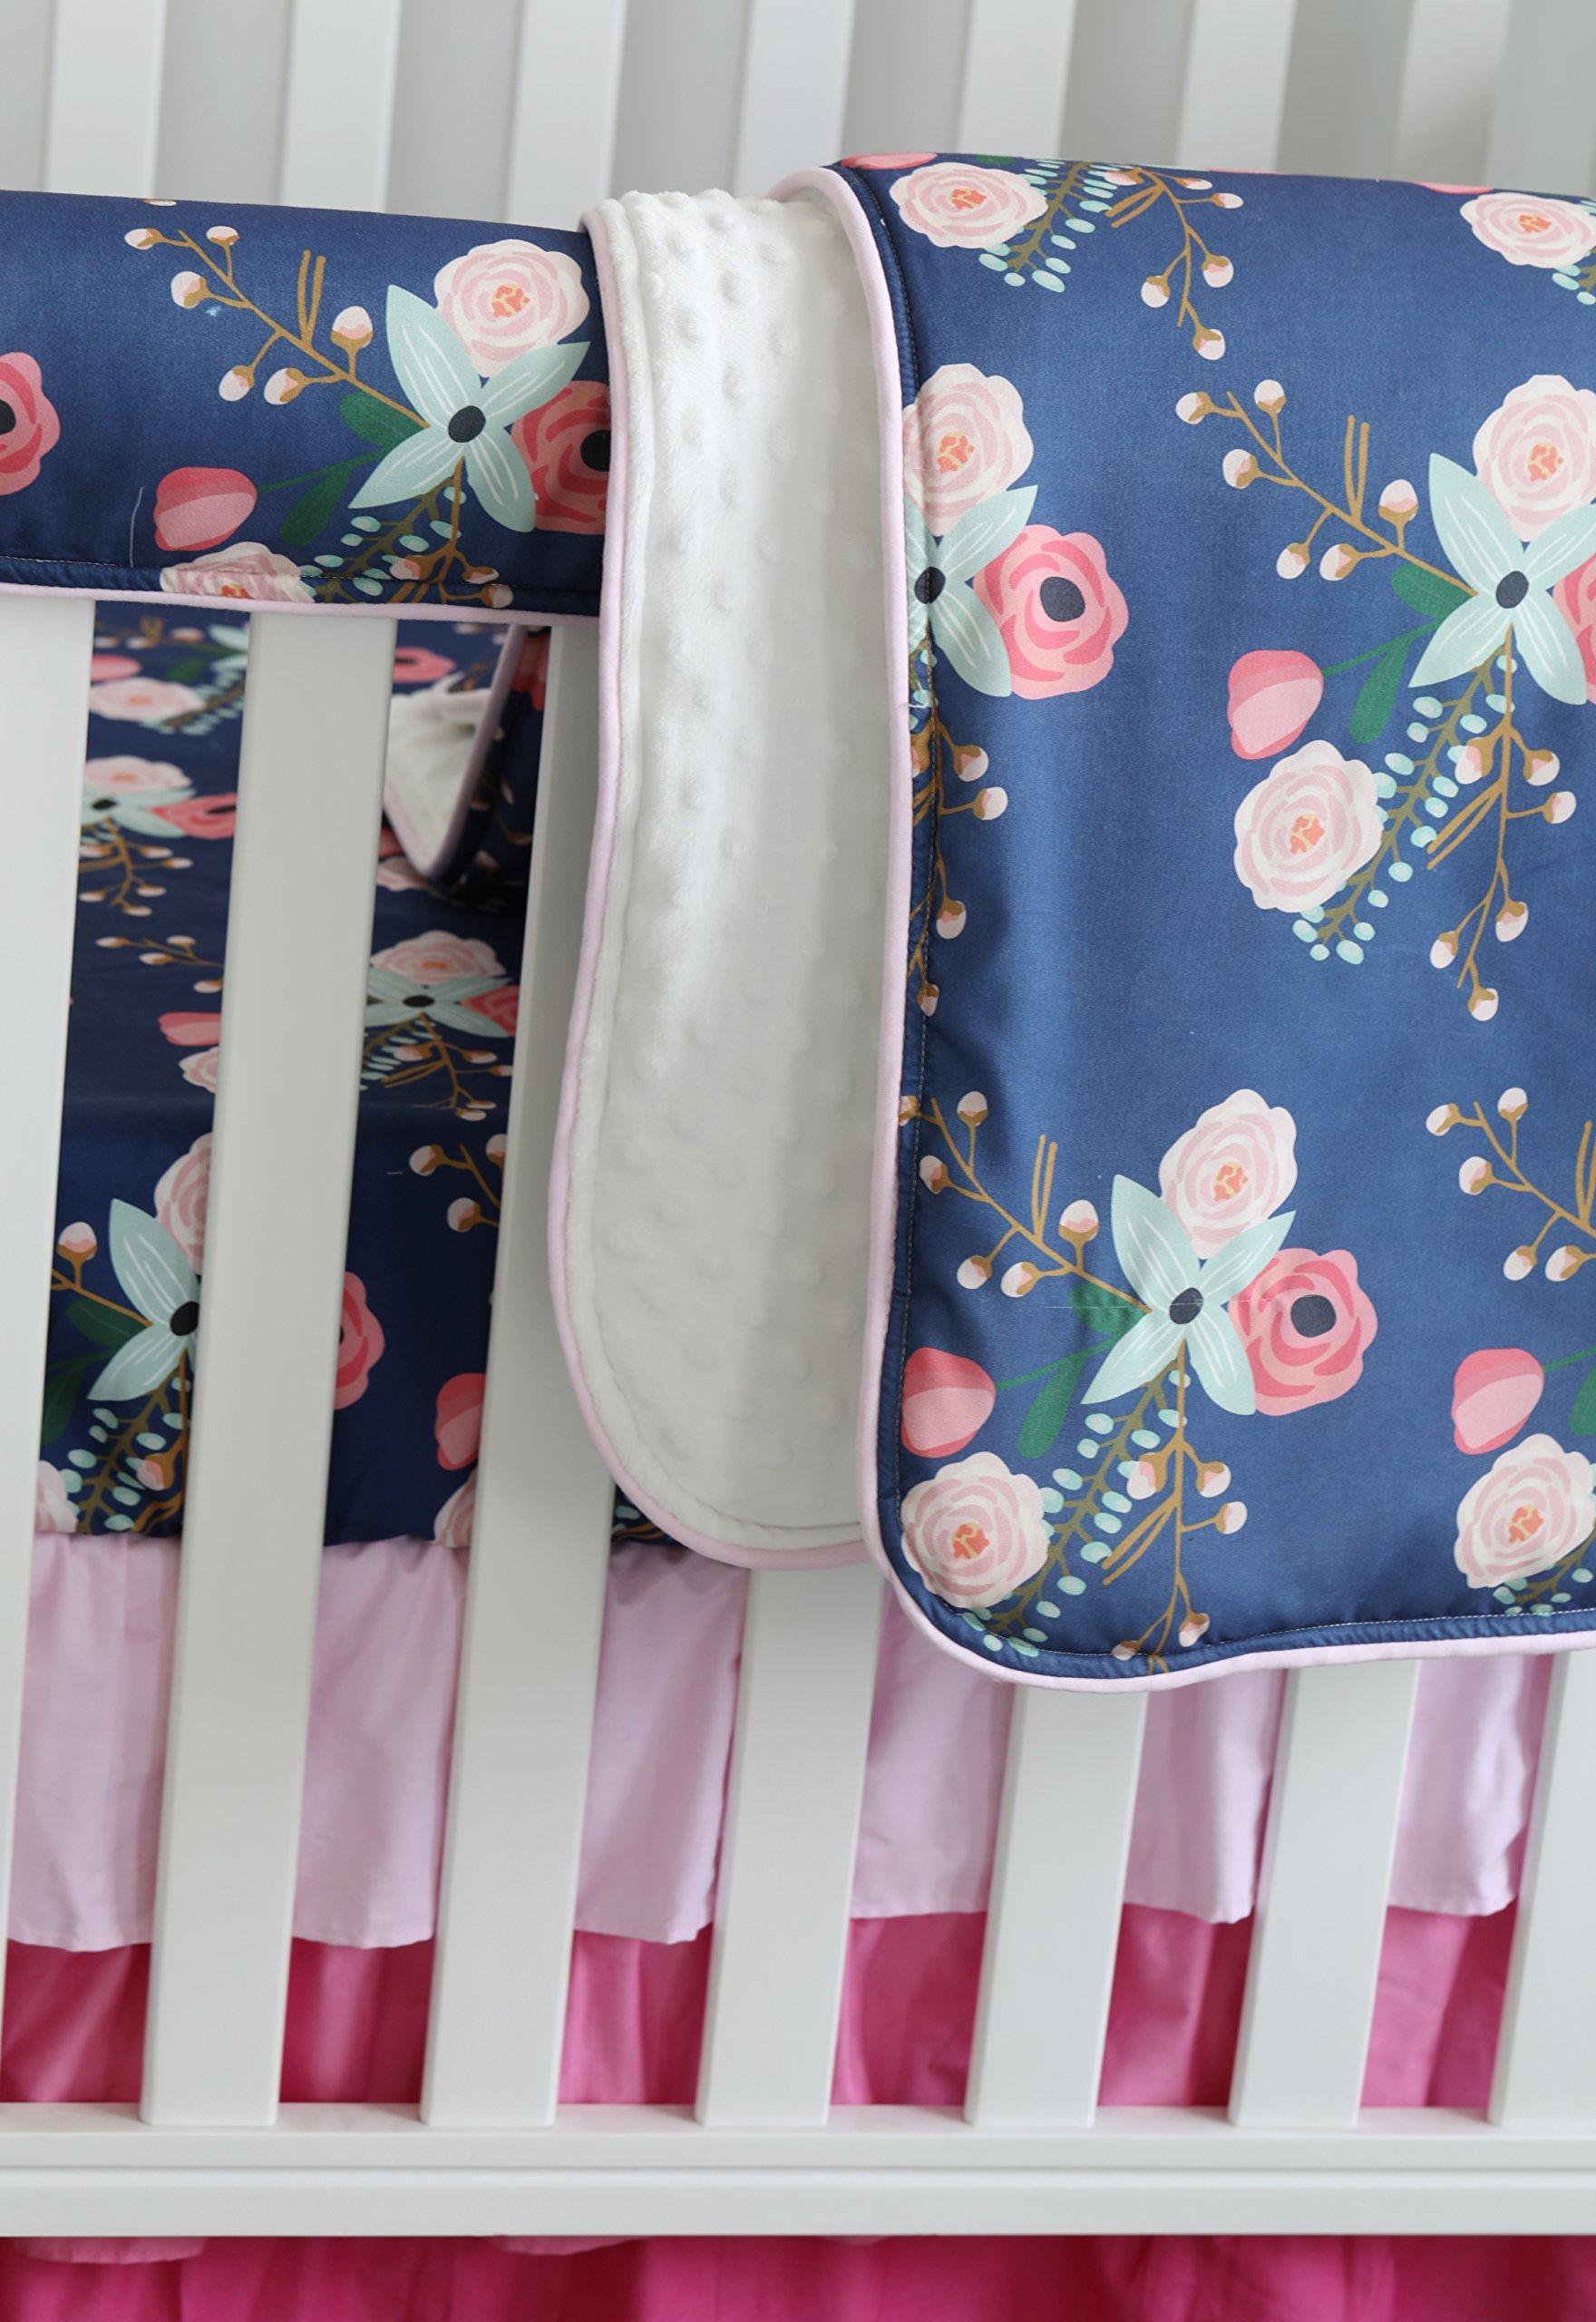 3 pcs set Boho Floral Ruffle Baby Minky Blanket Water color, Peach Floral Nursery Crib Skirt Set Baby Girl Crib Bedding (Navy Blue)